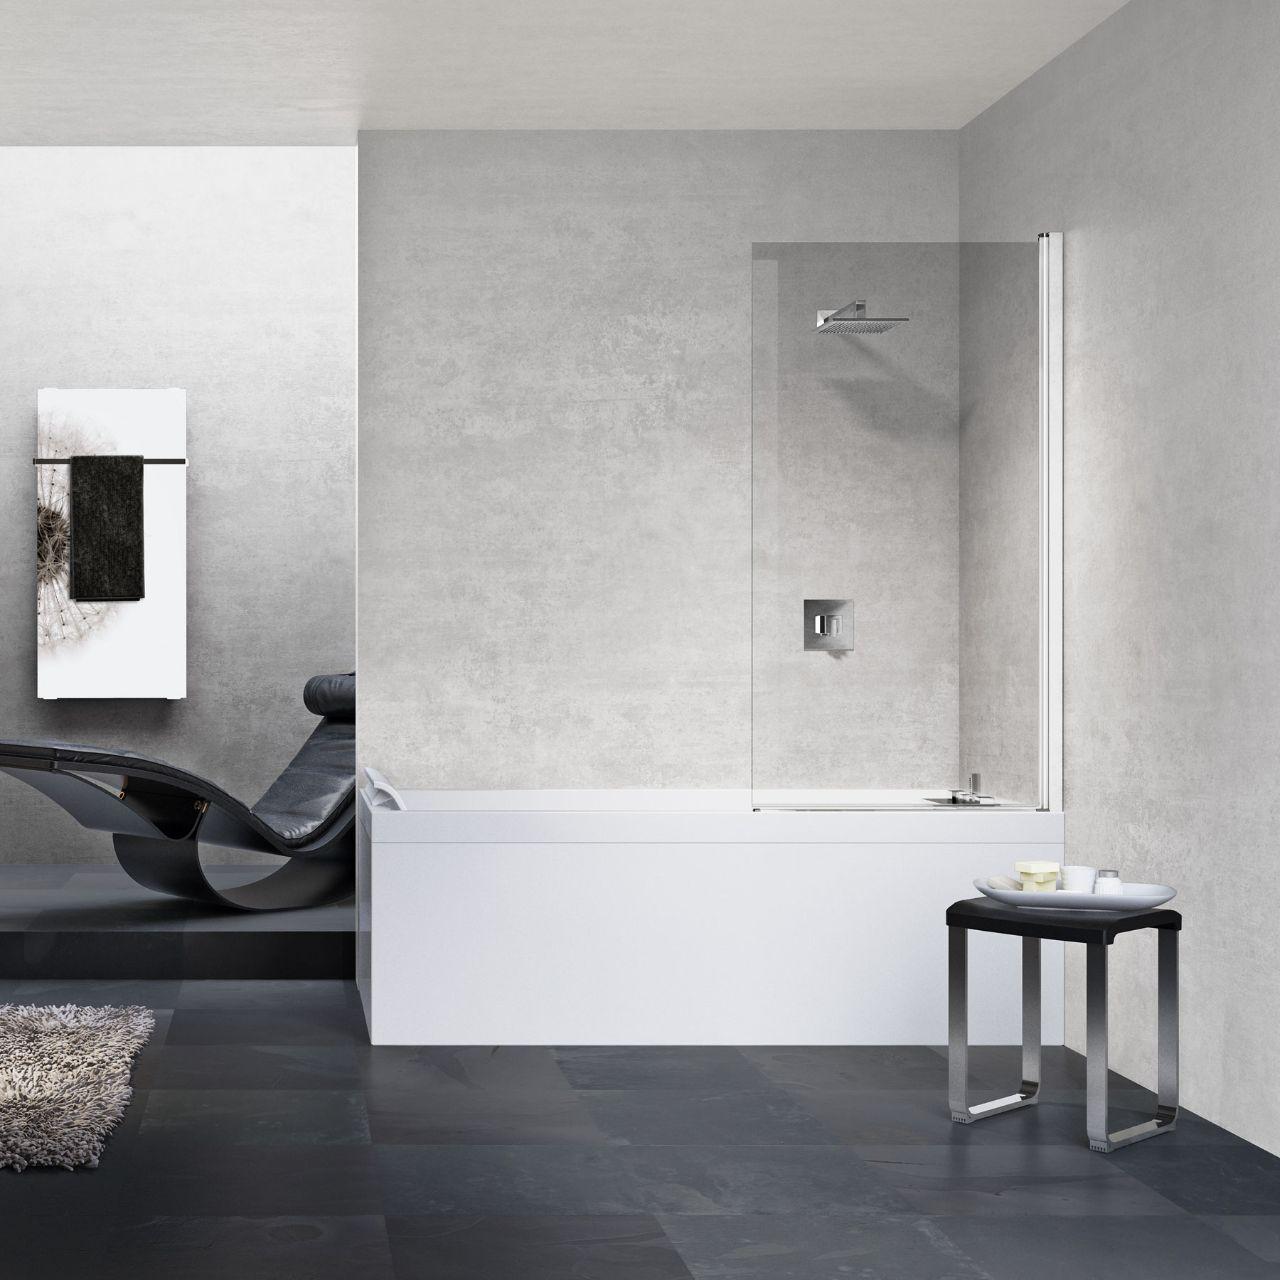 pare baignoires young 2 0 1v novellini. Black Bedroom Furniture Sets. Home Design Ideas